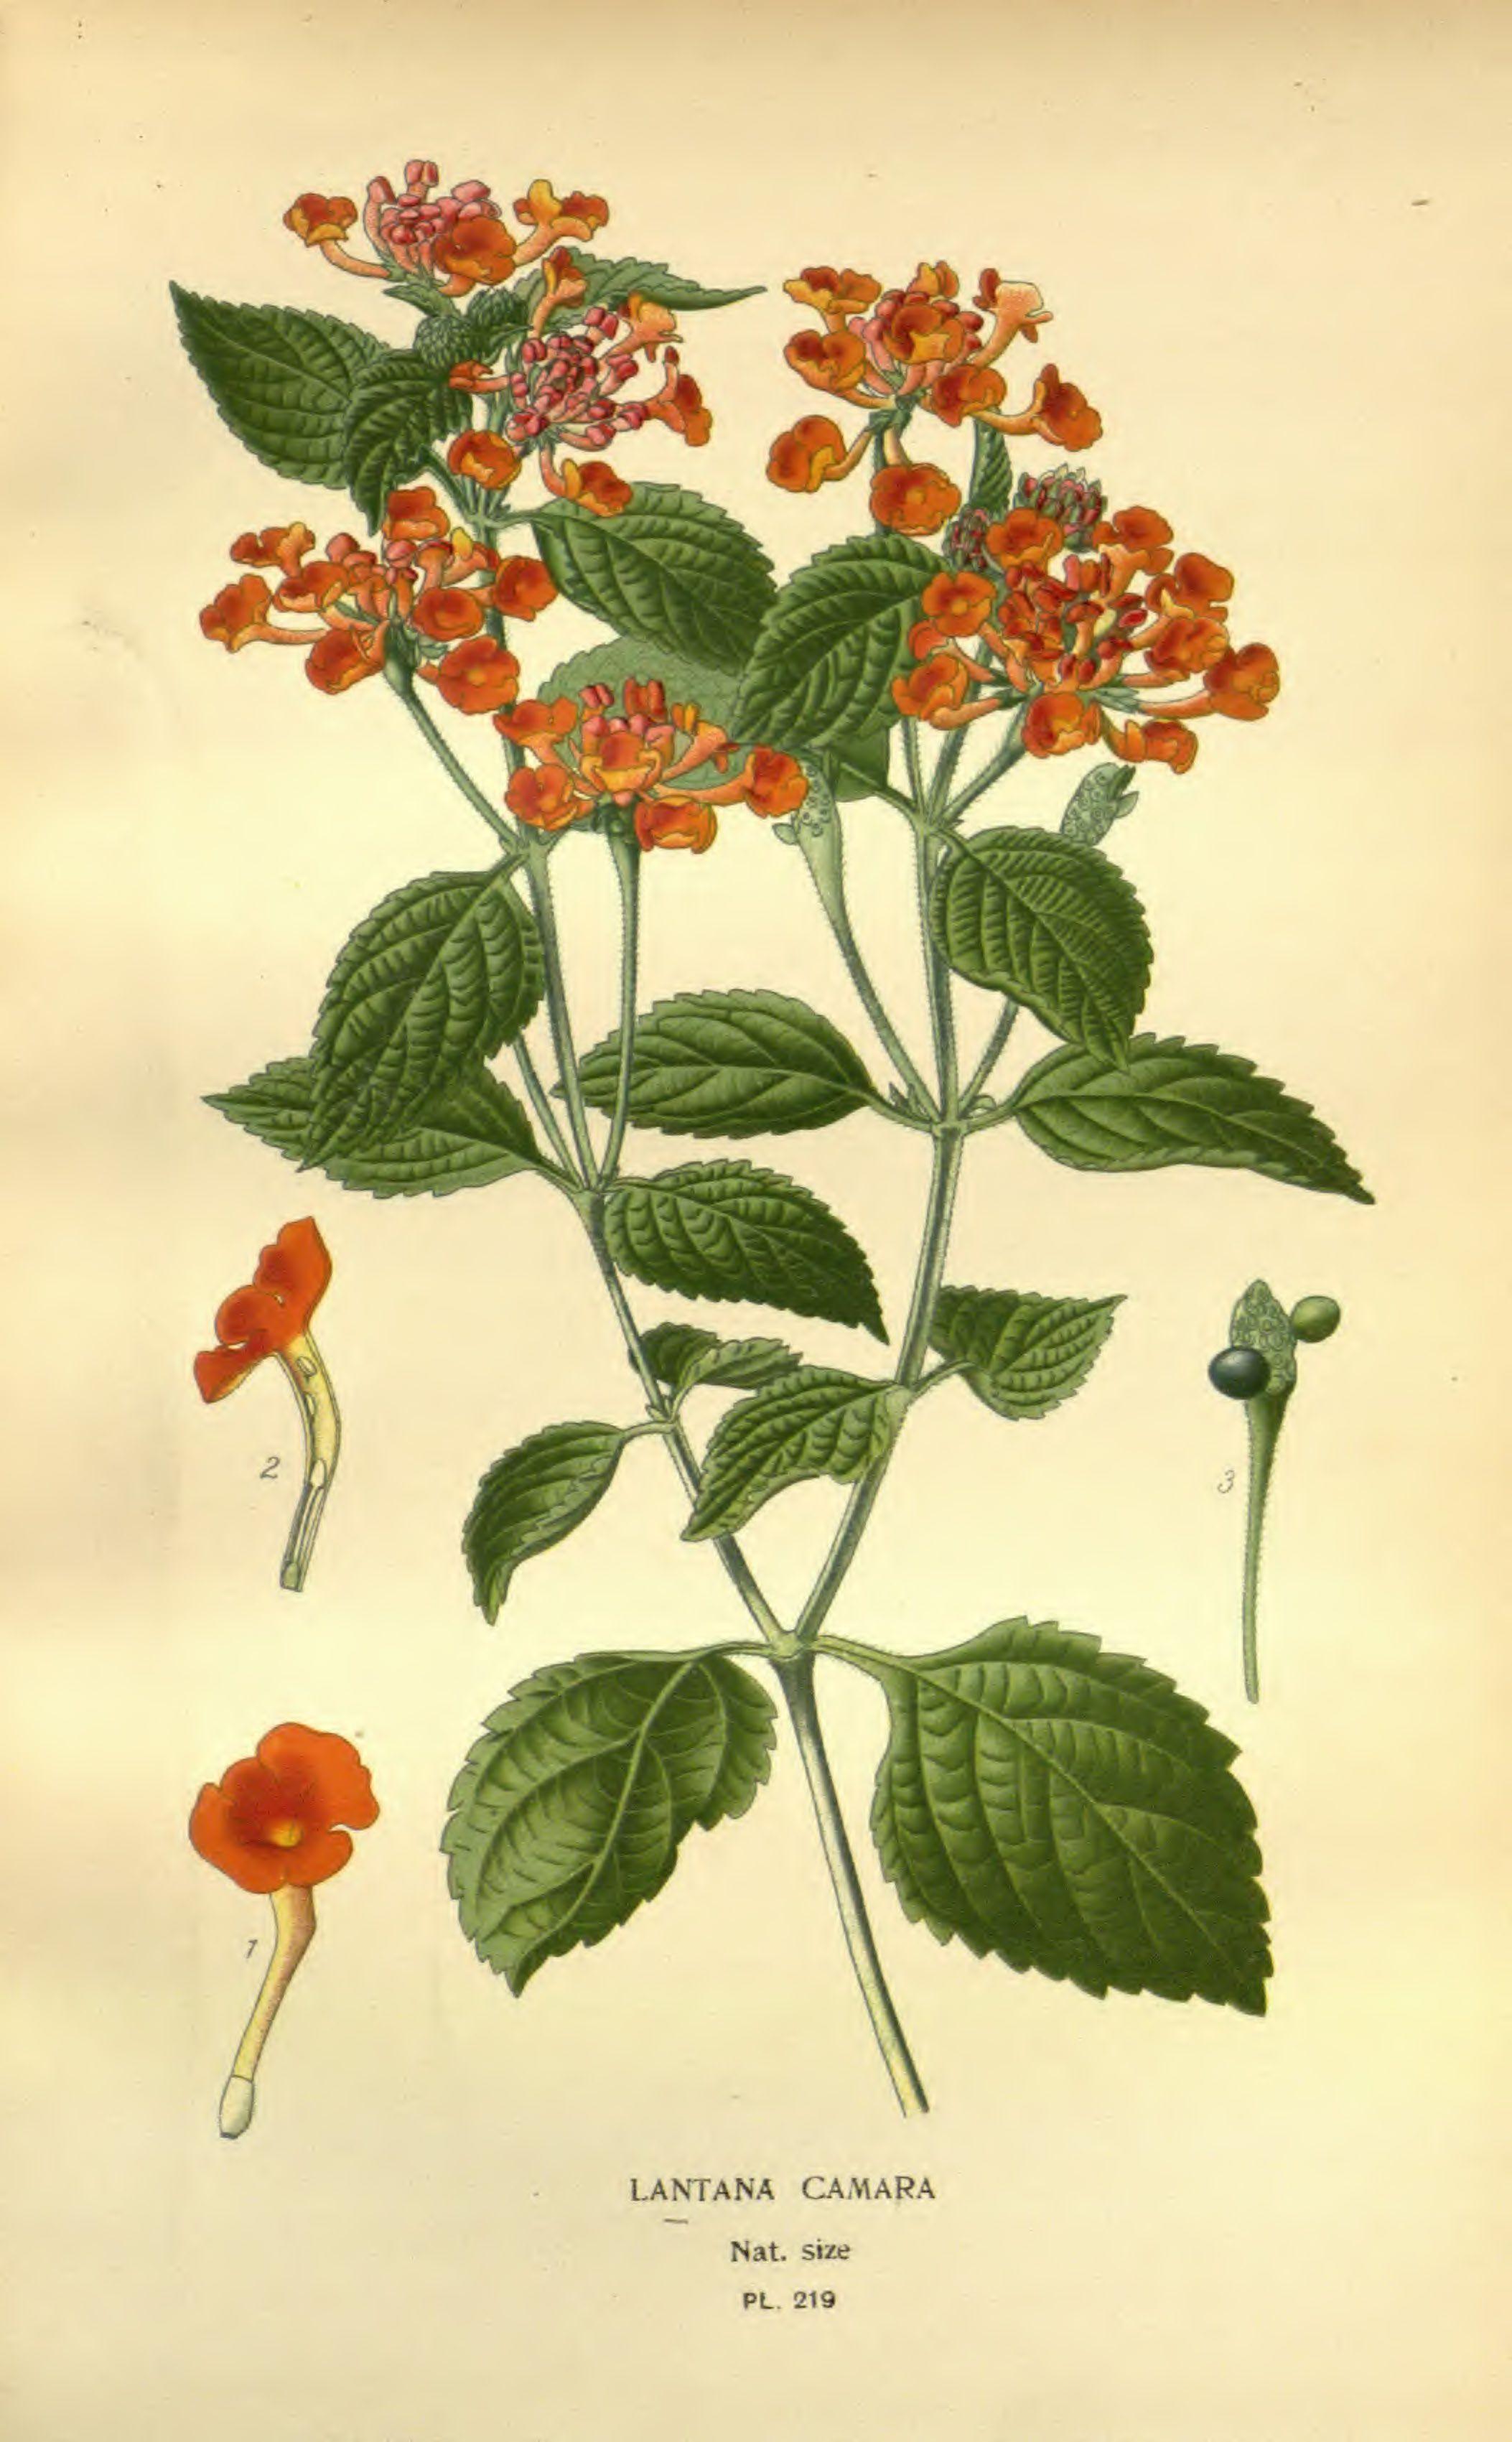 Lantana Camara Illustration Favourite Flowers Of Garden And Greenhouse V03 Edward Step 1896 Lantana Lantana Camara Lantana Flower